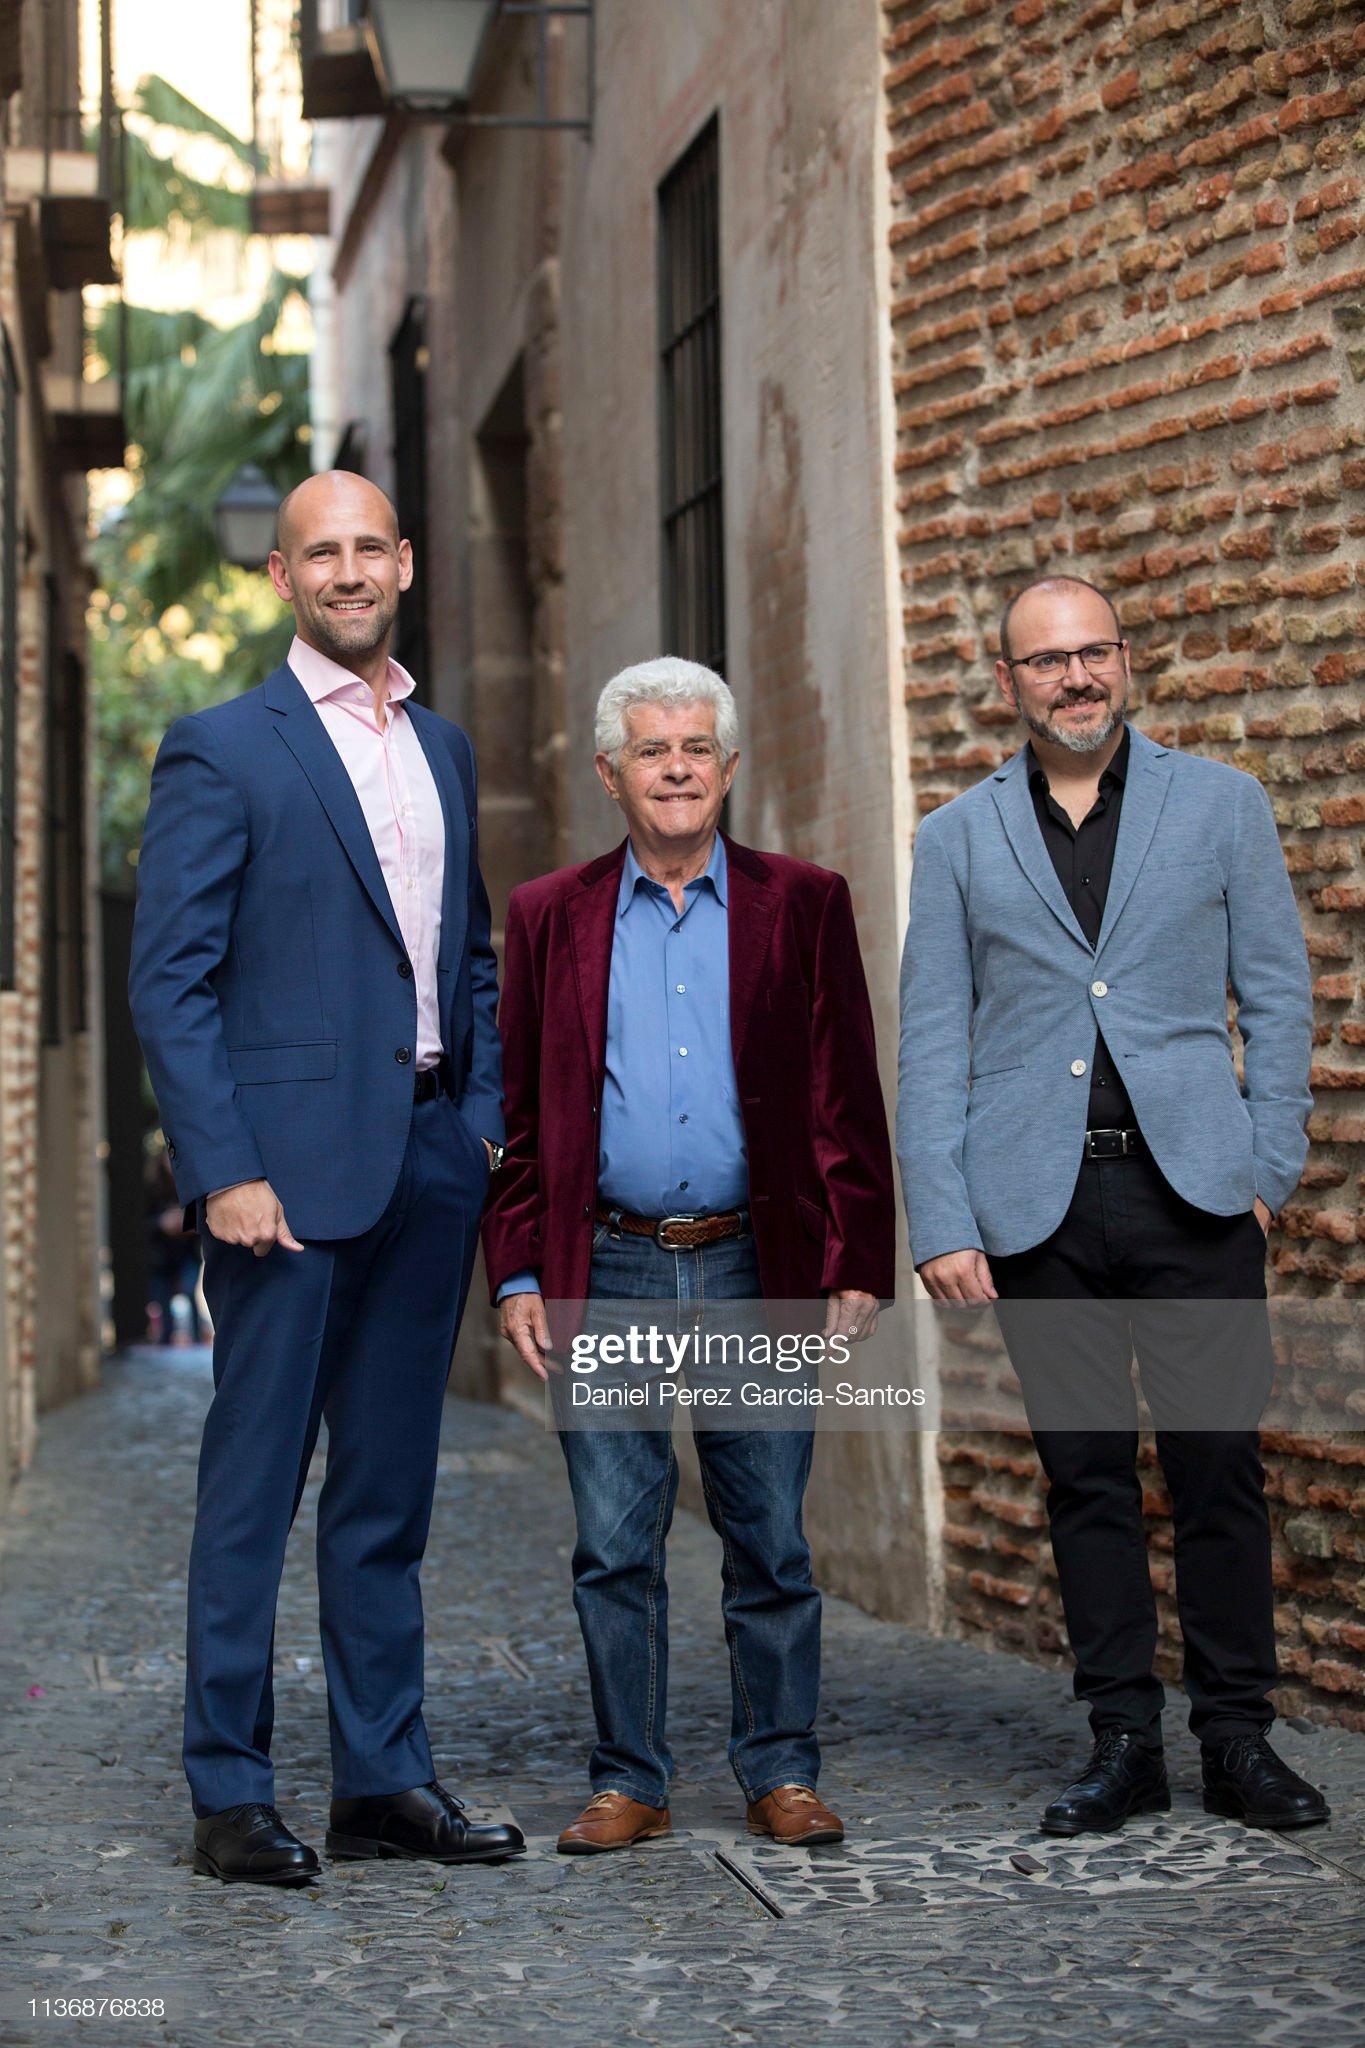 ¿Cuánto mide Gonzalo Miró? - Altura Gonzalo-miro-actor-guillermo-montesinos-and-director-victor-matellano-picture-id1136876838?s=2048x2048